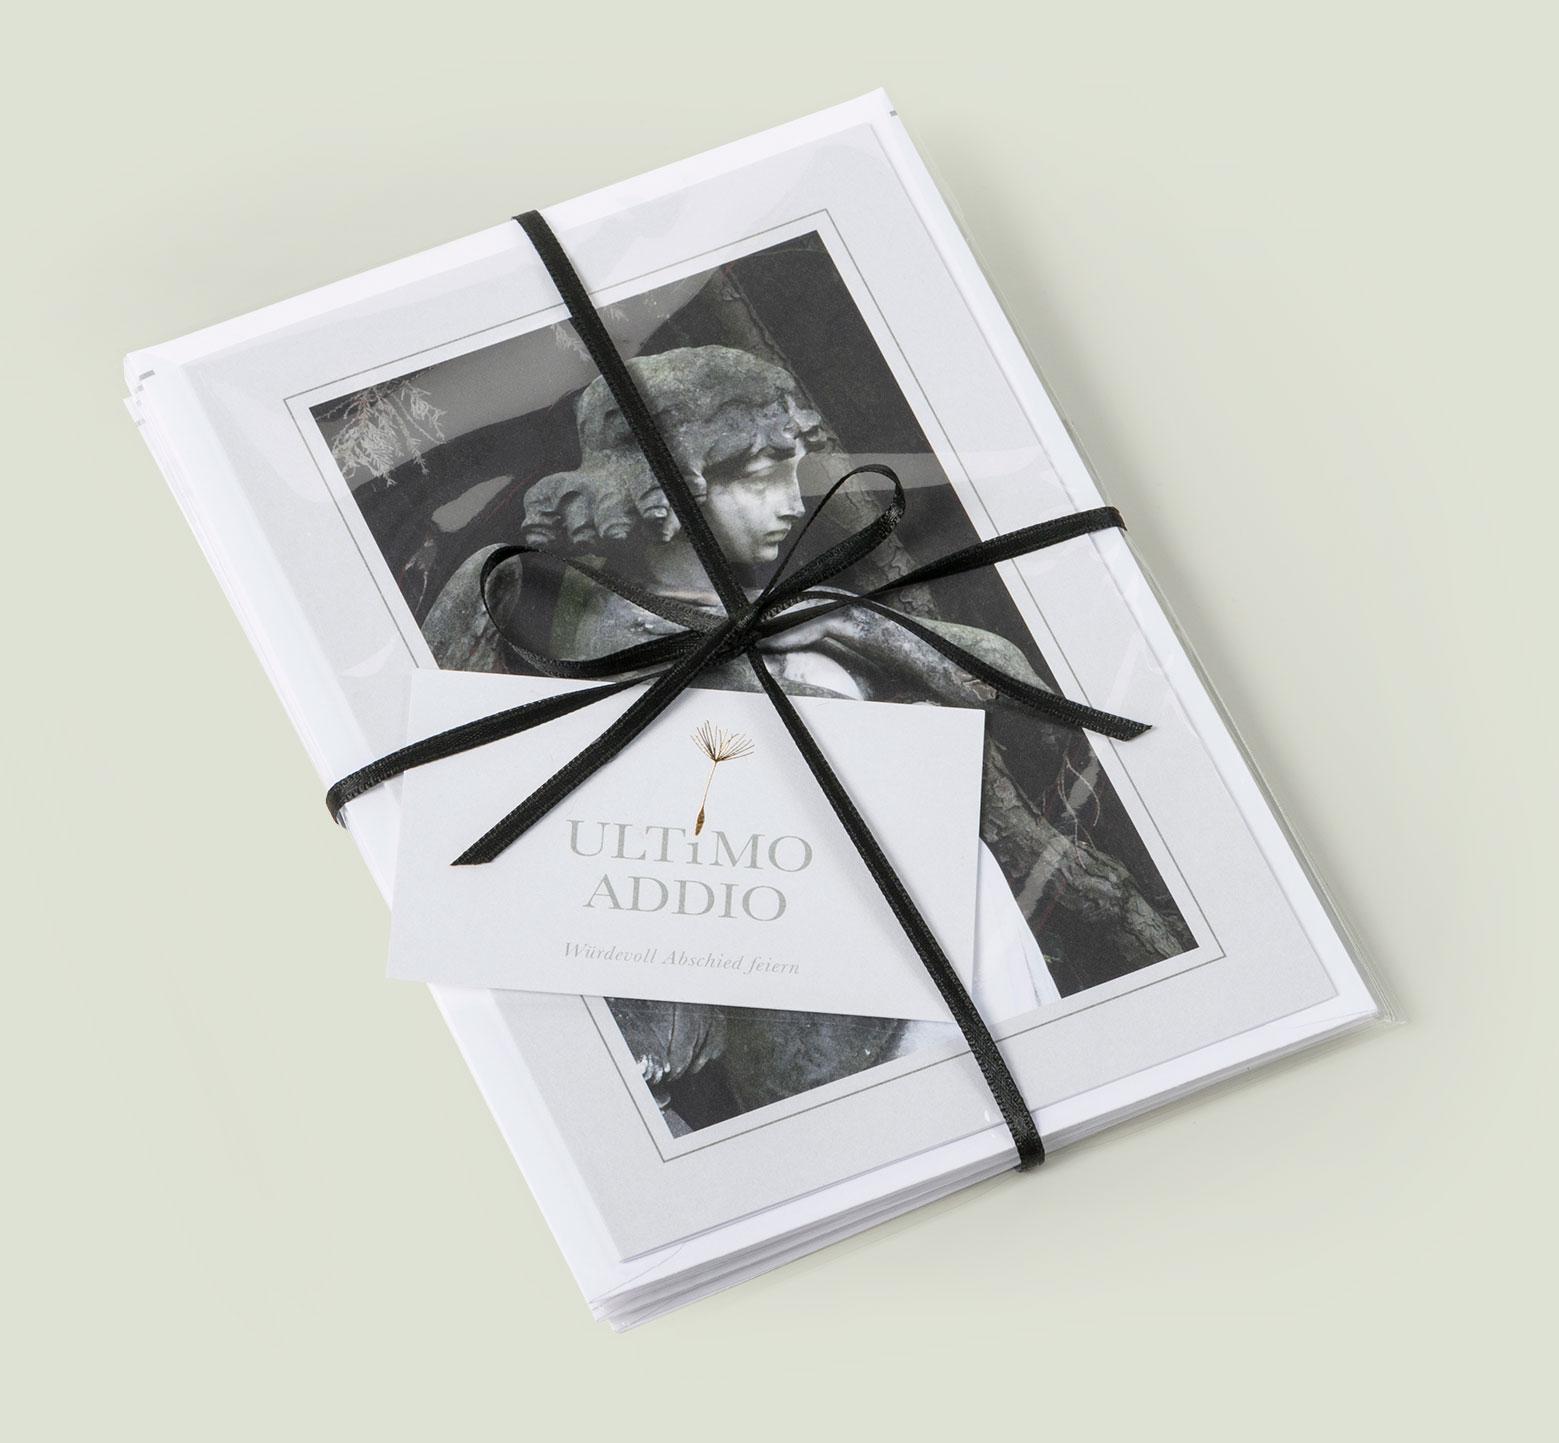 trauerkarten_ultimo-addio